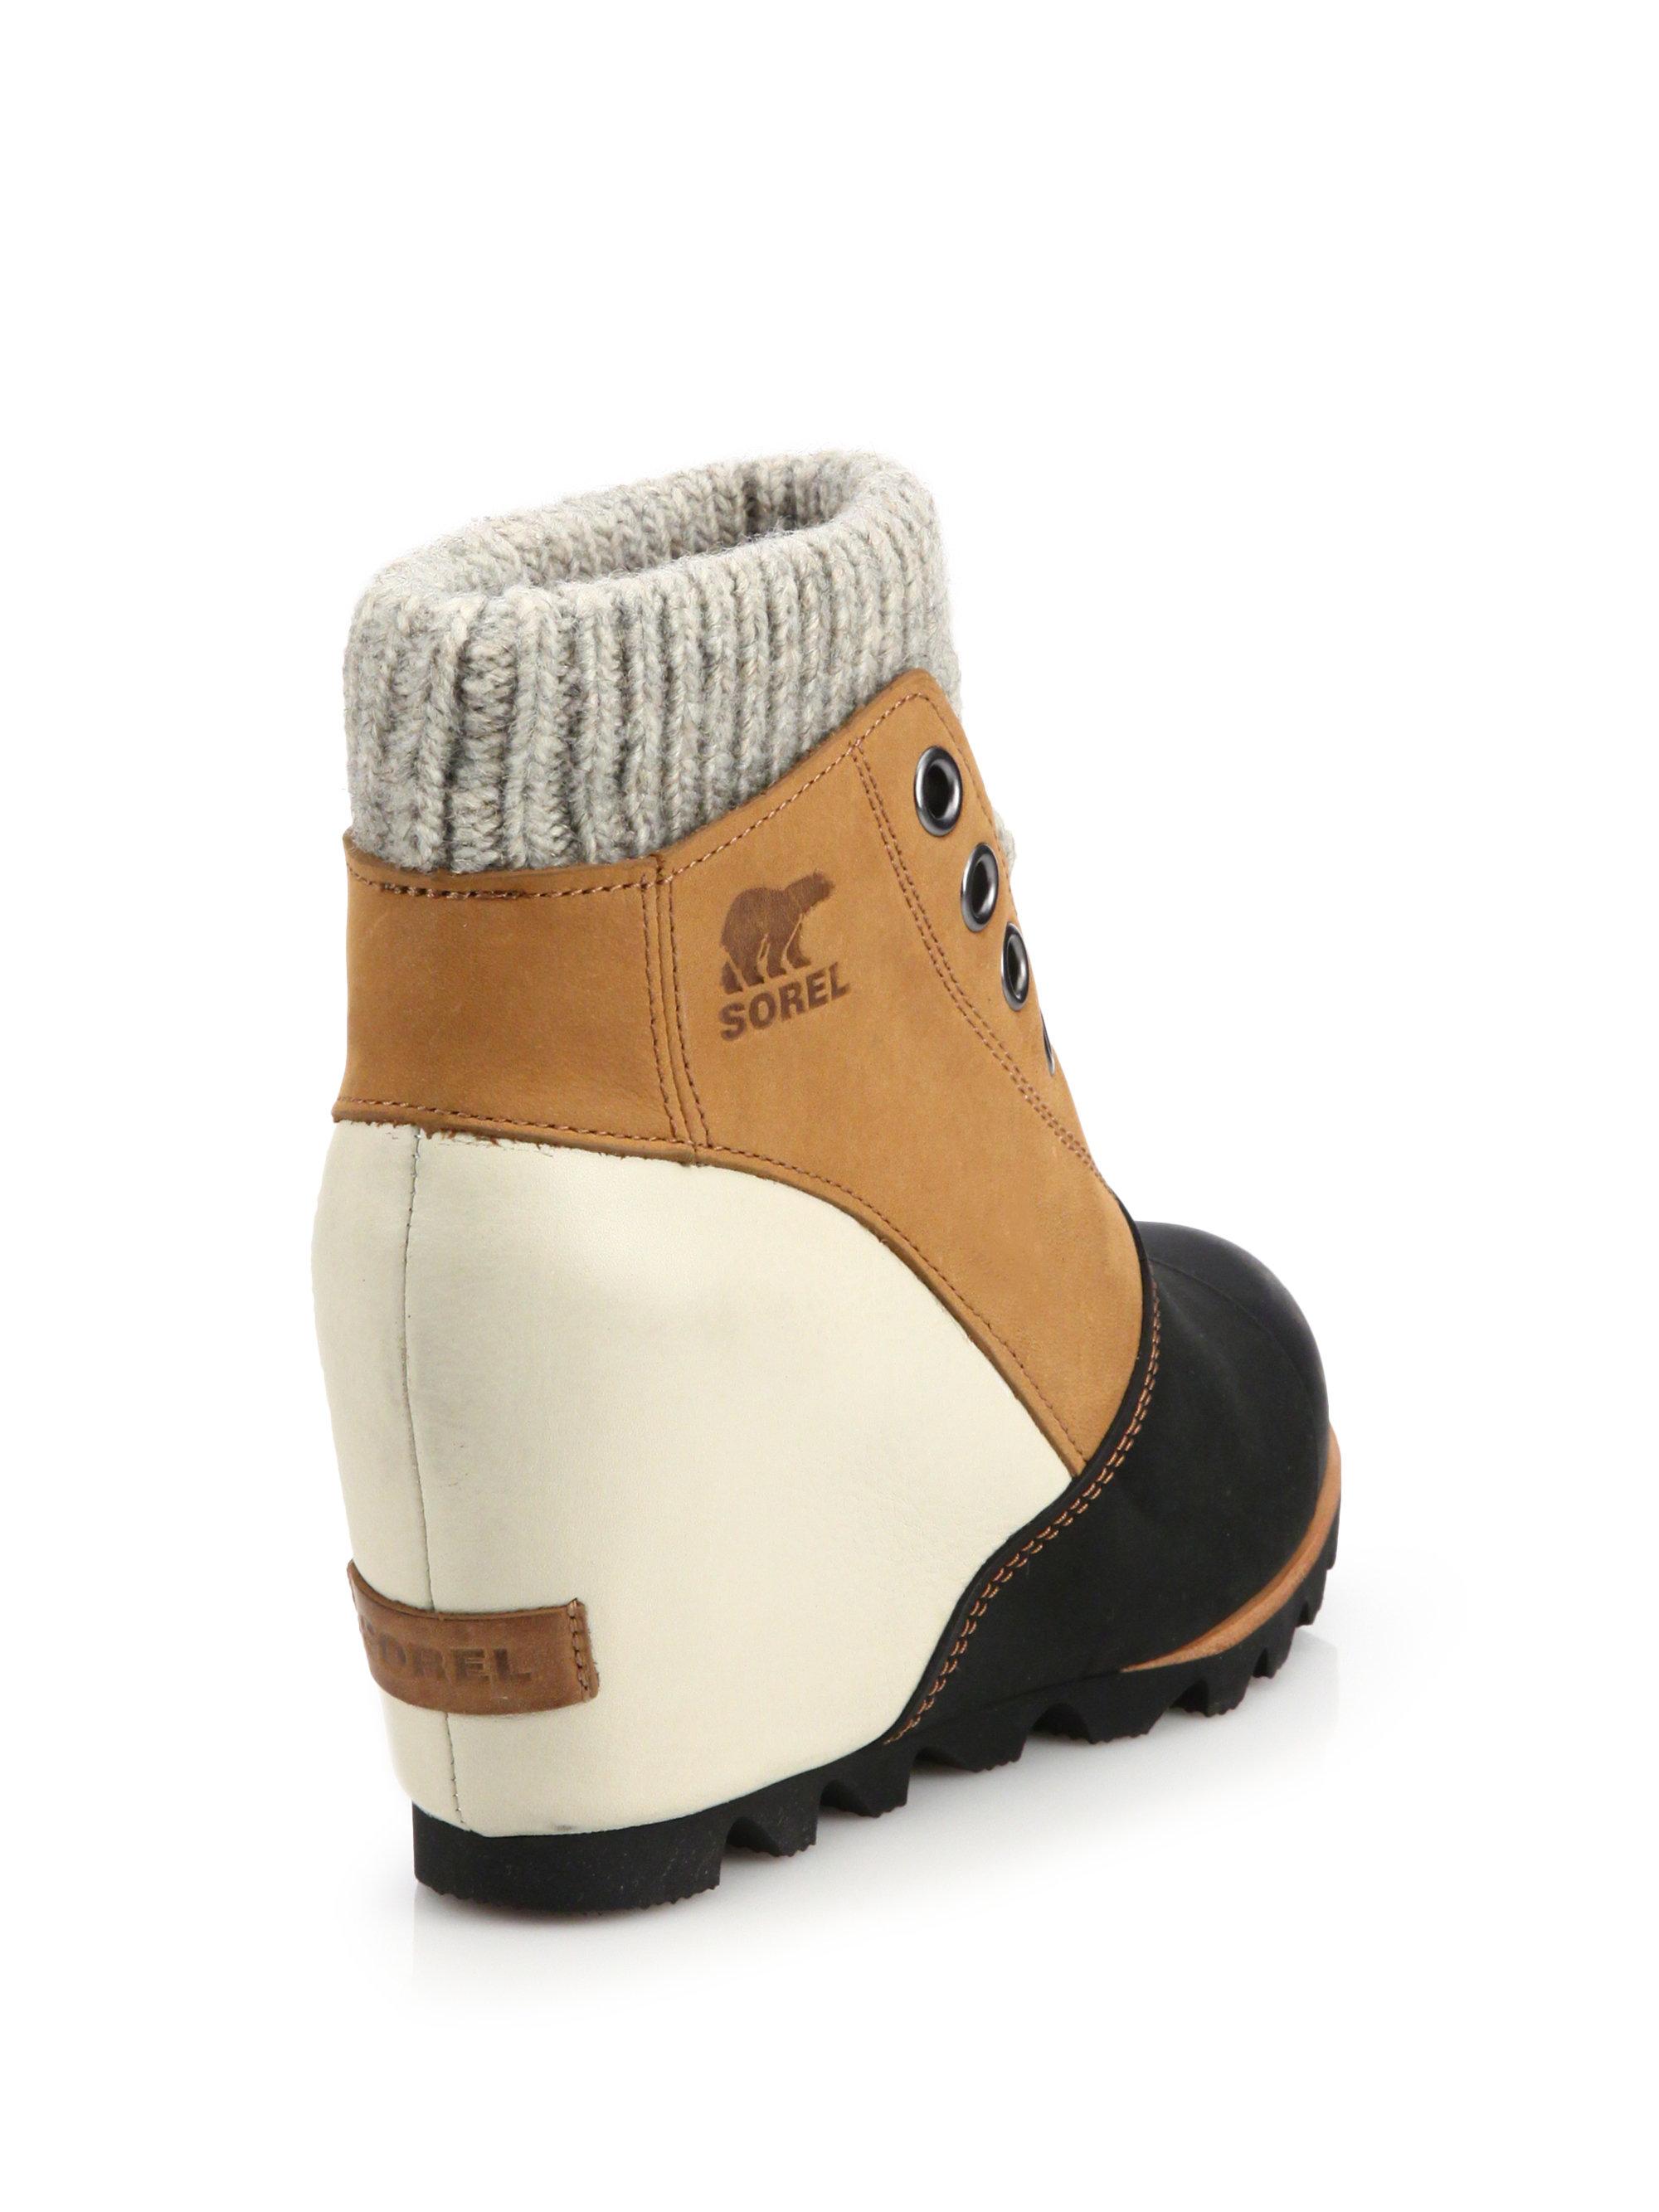 Lyst Sorel Joanie Sweater Leather Wedge Booties